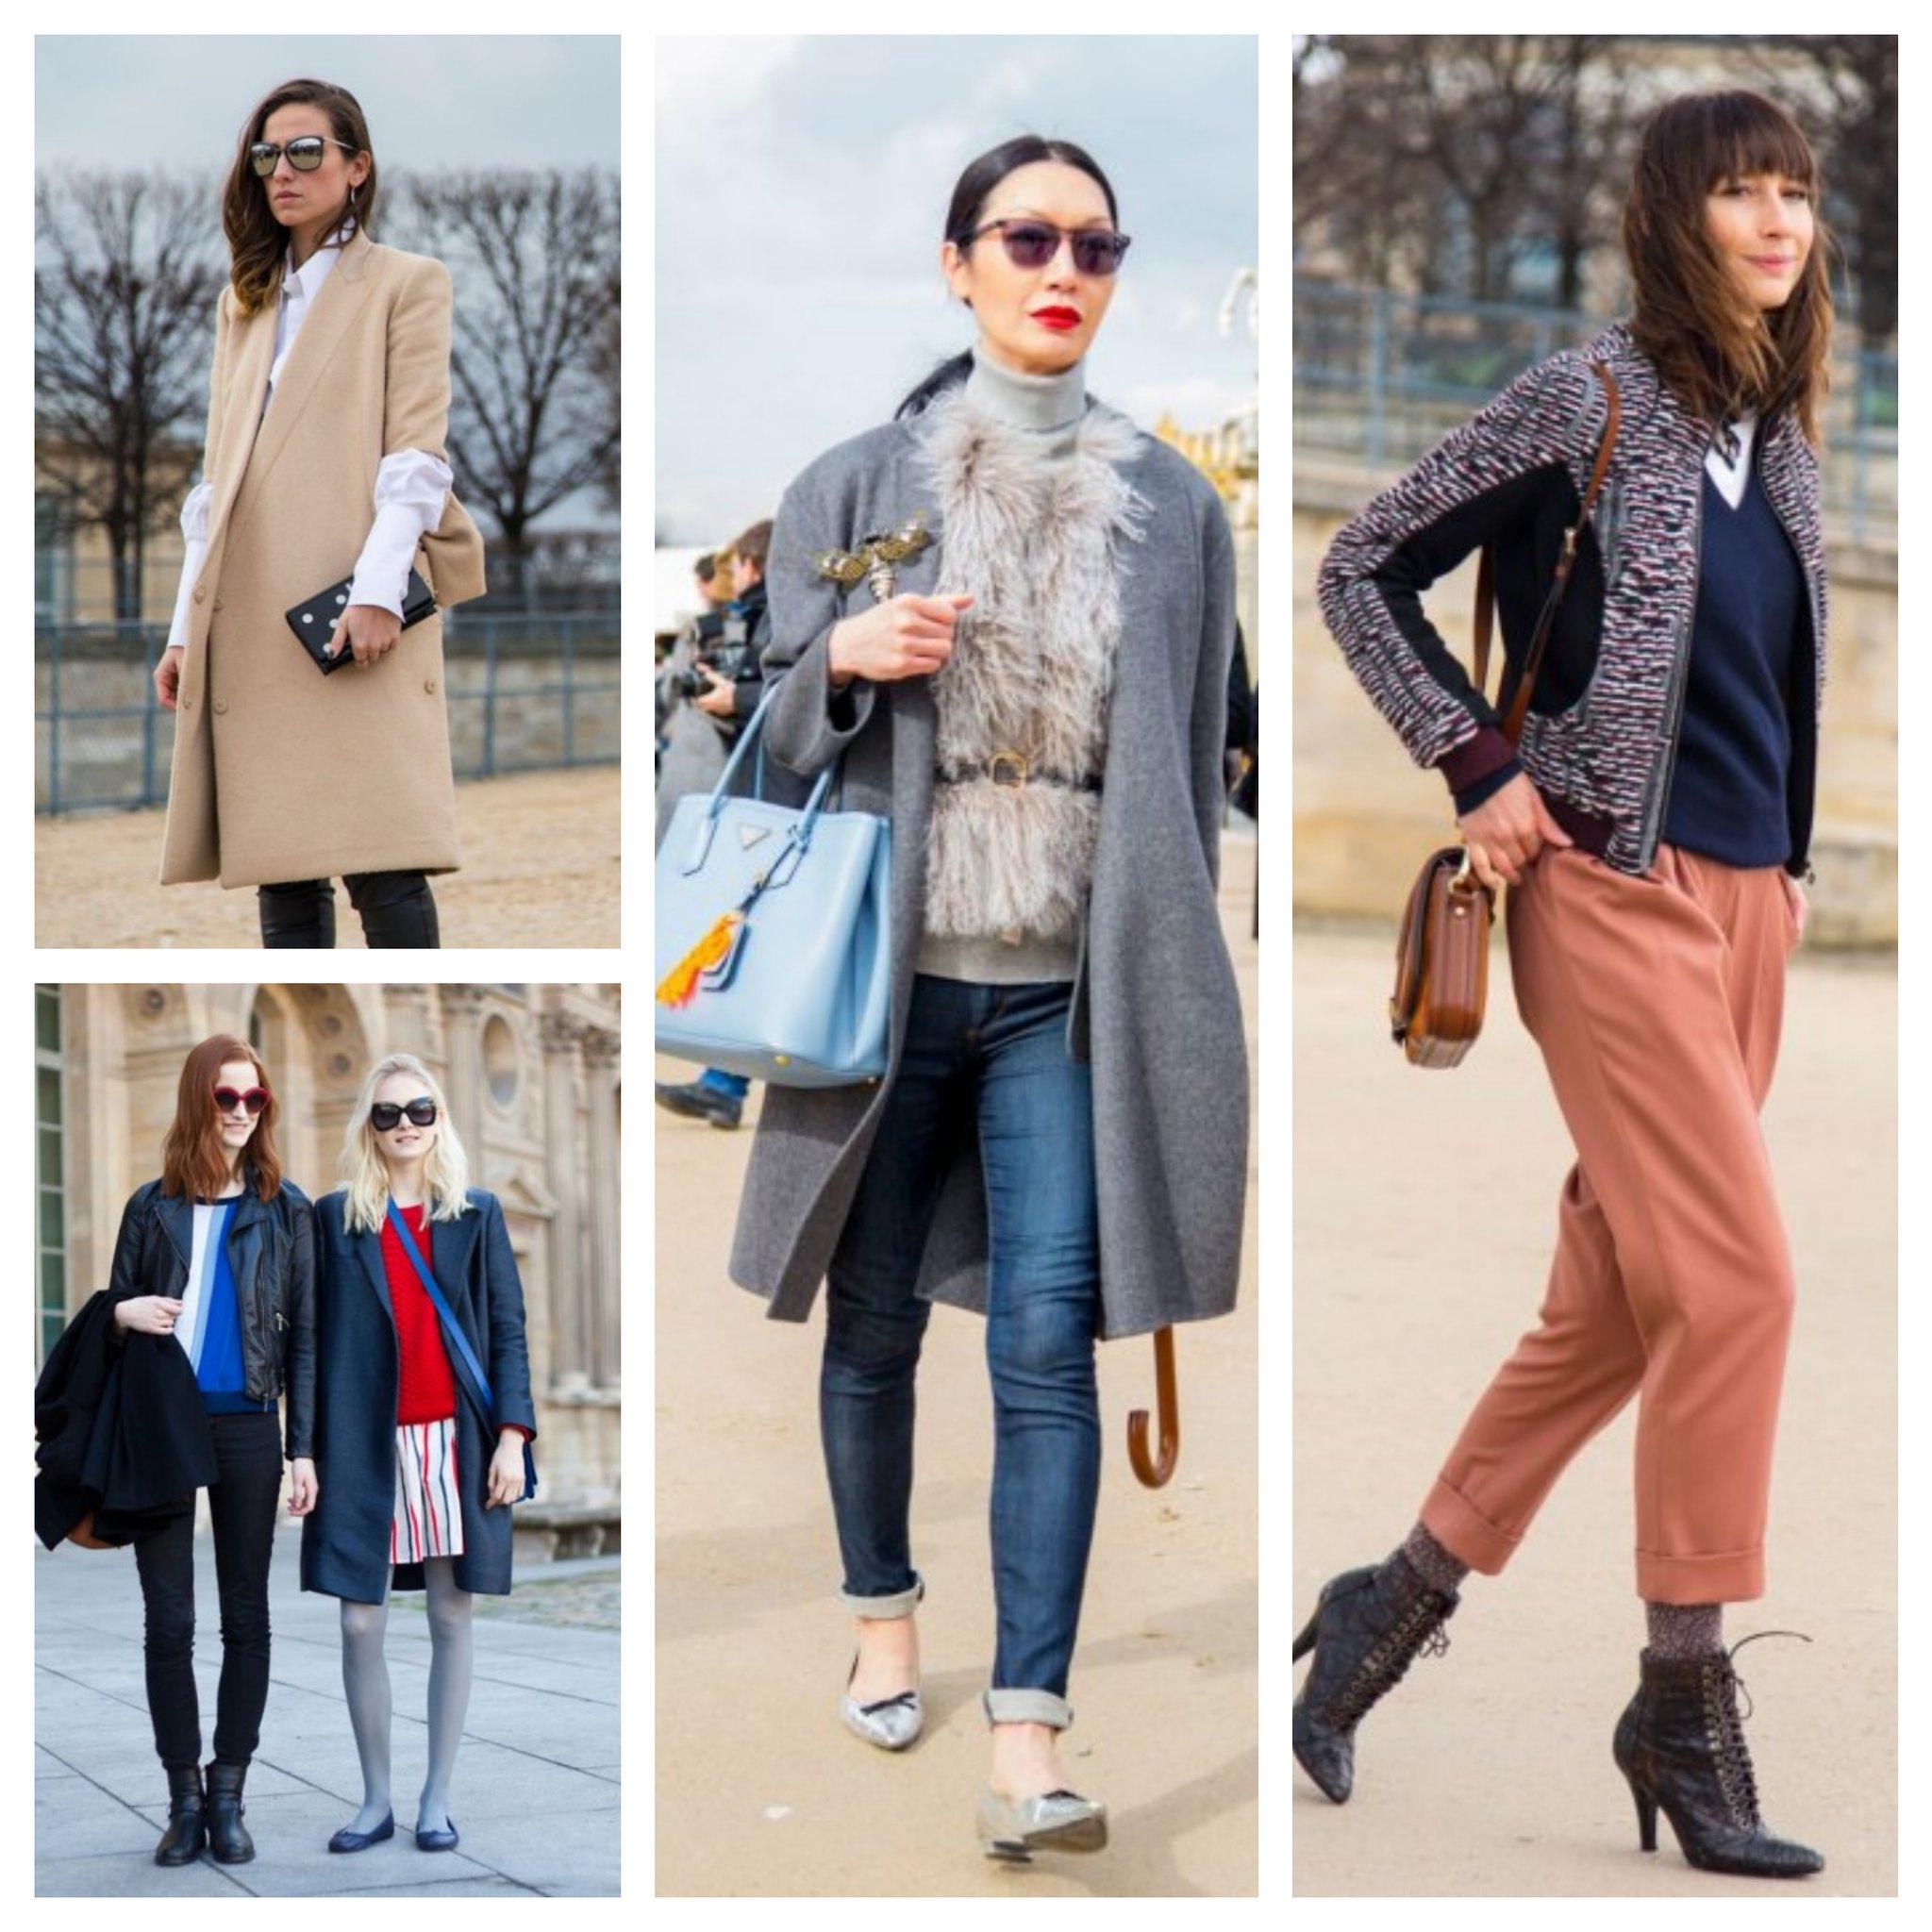 Paris fashion week autumn/Winter 2014